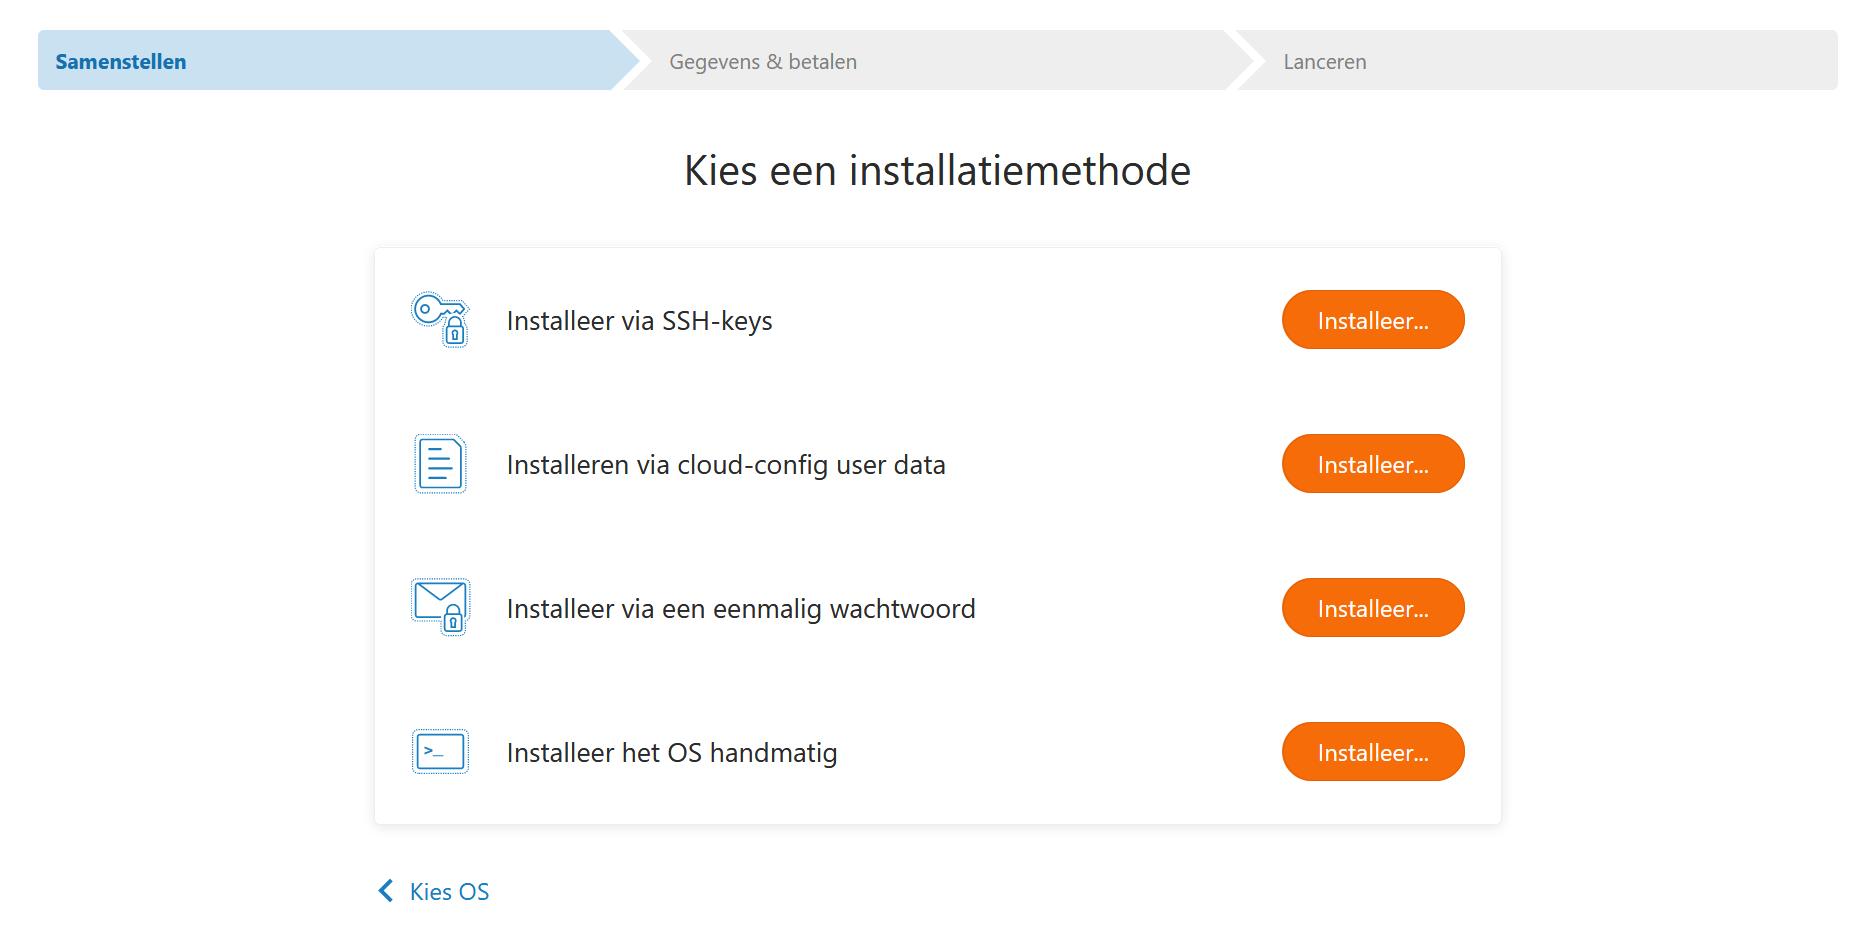 vps fast installs kies methode